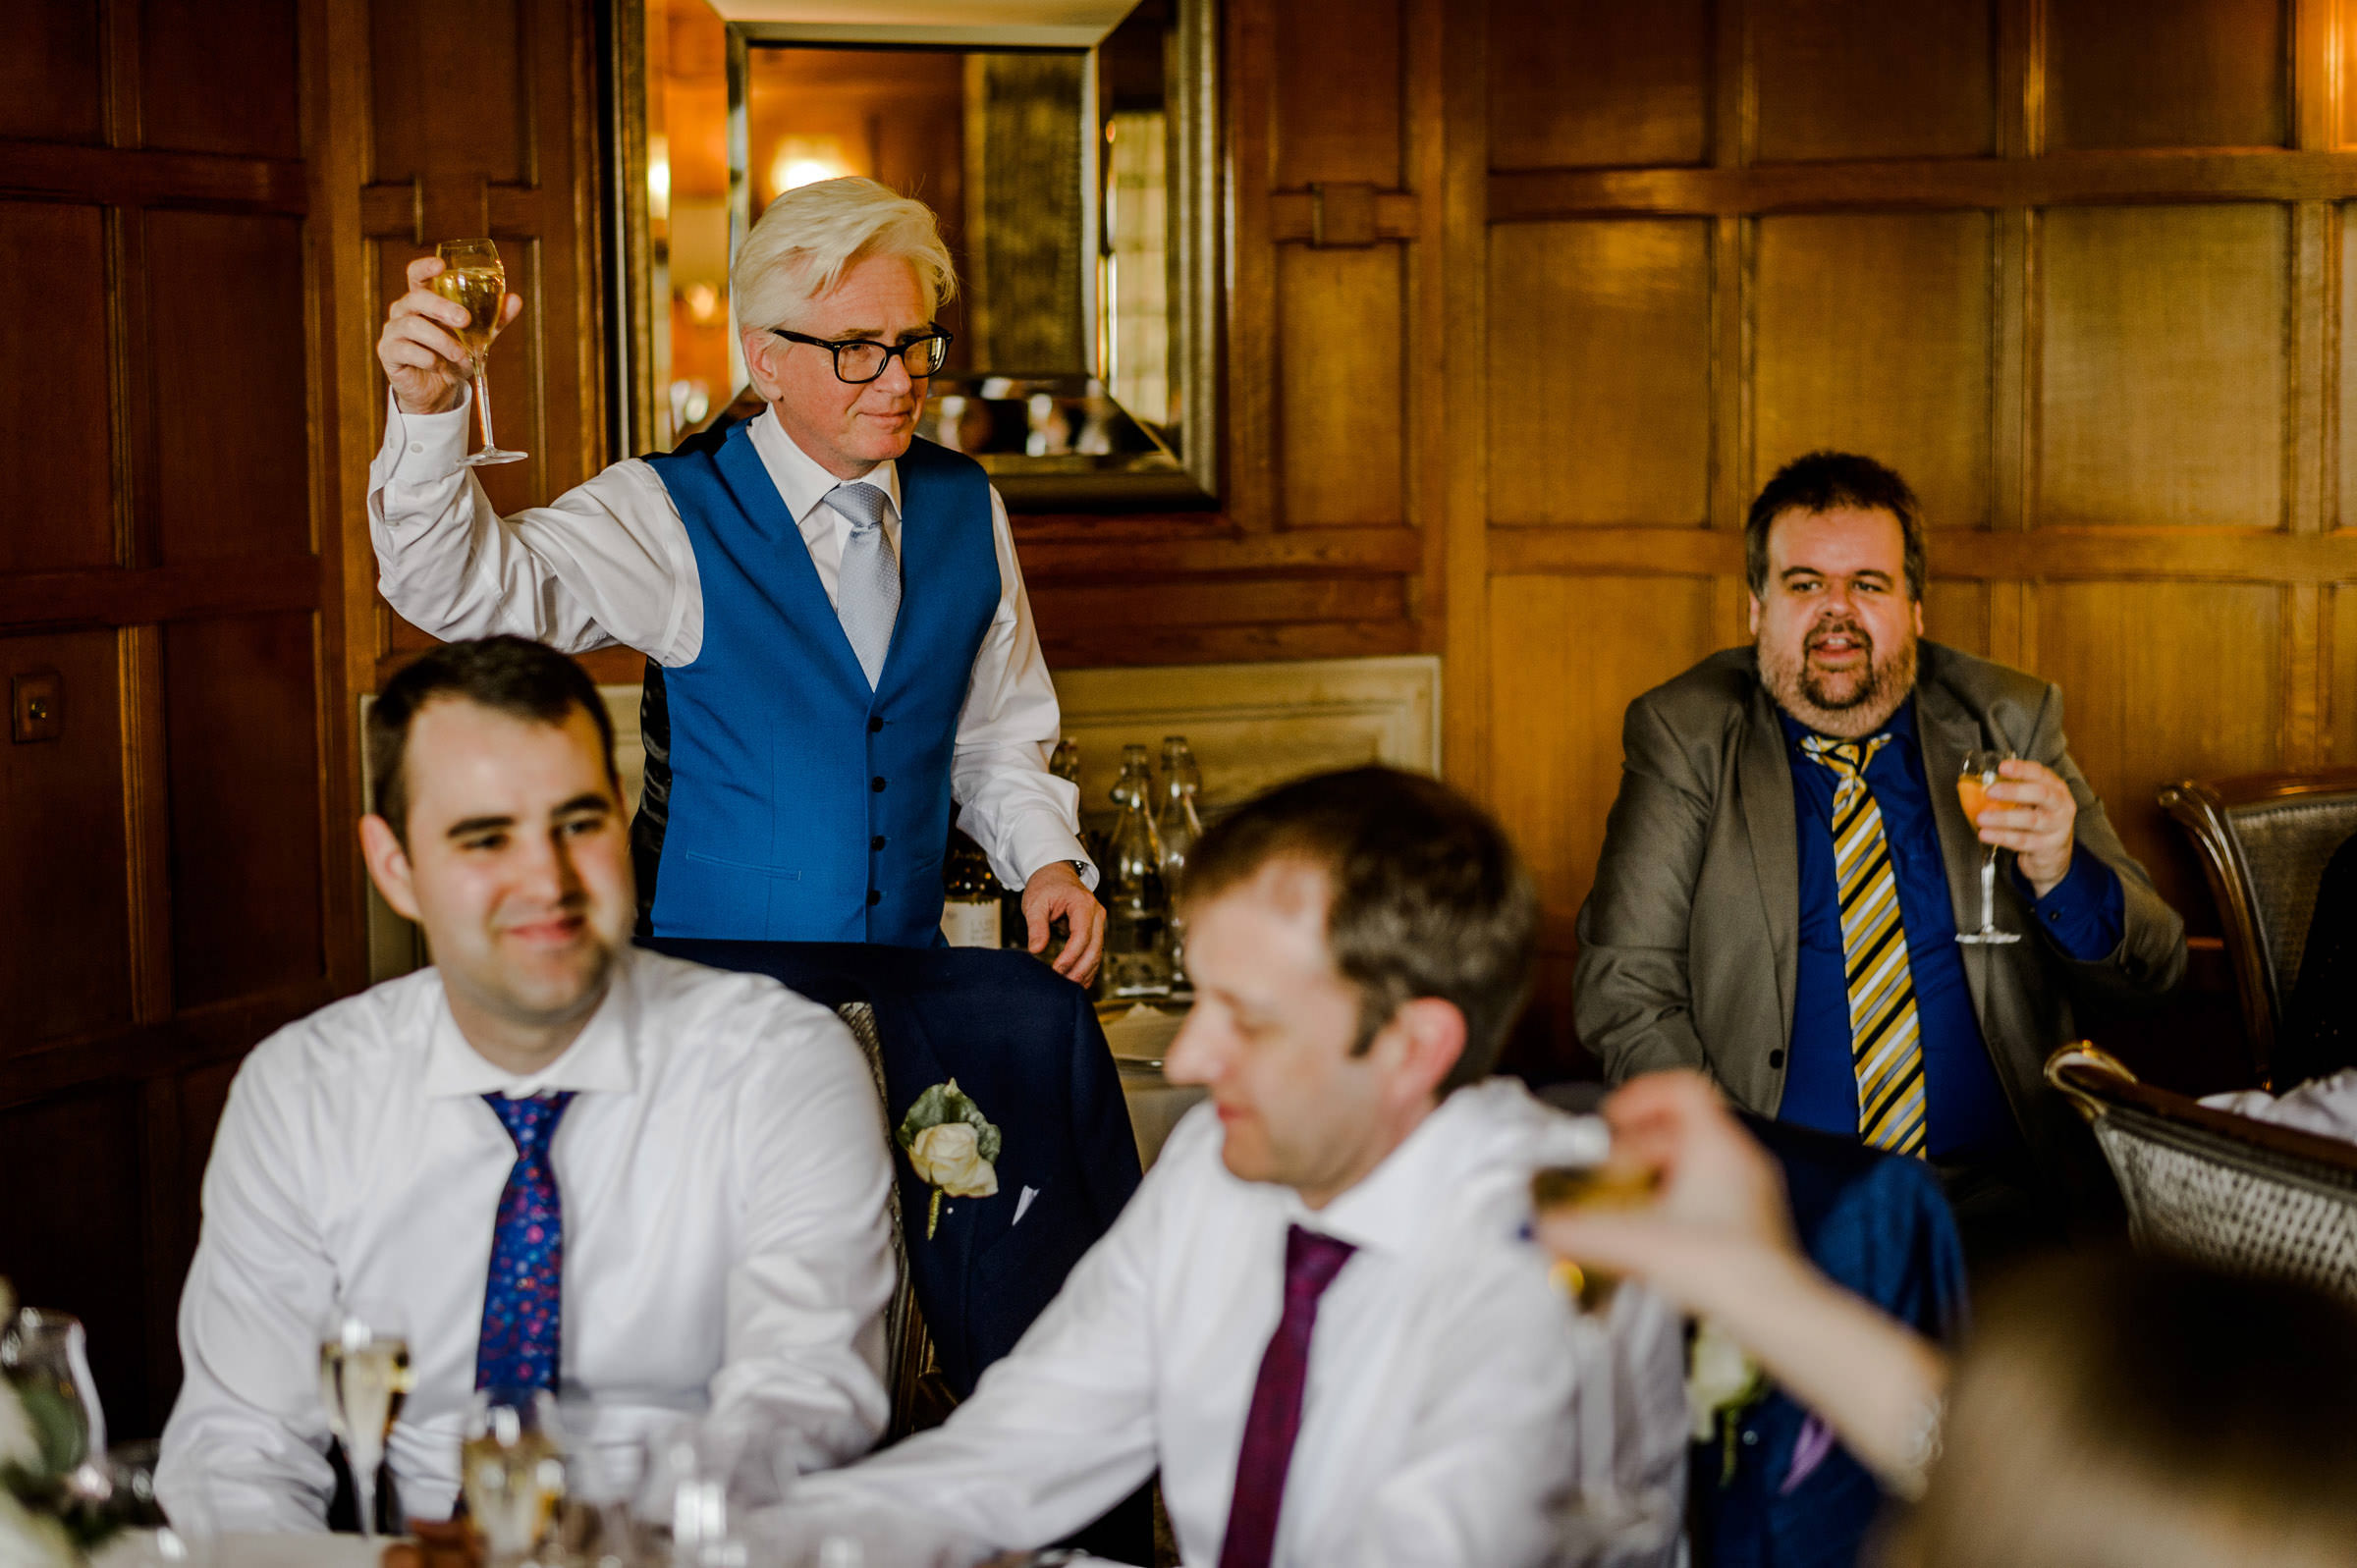 Wedding photography at Mallory Court 021.jpg